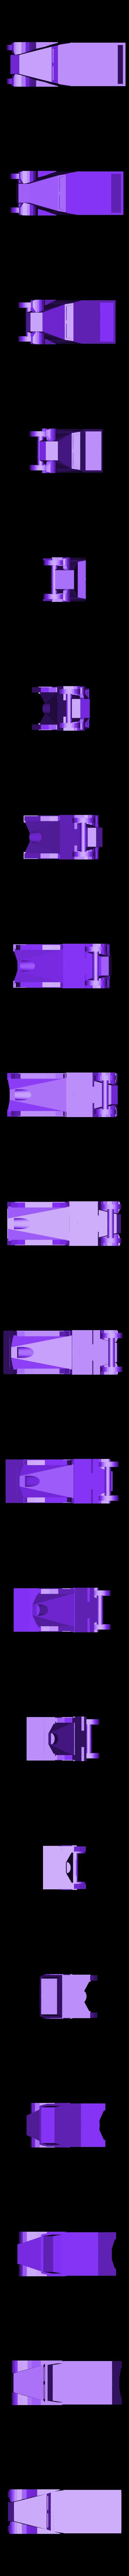 M3 halftrack unarmed.stl Download STL file M3 Half-track APC (unarmed) • 3D printing model, AntarcticFox